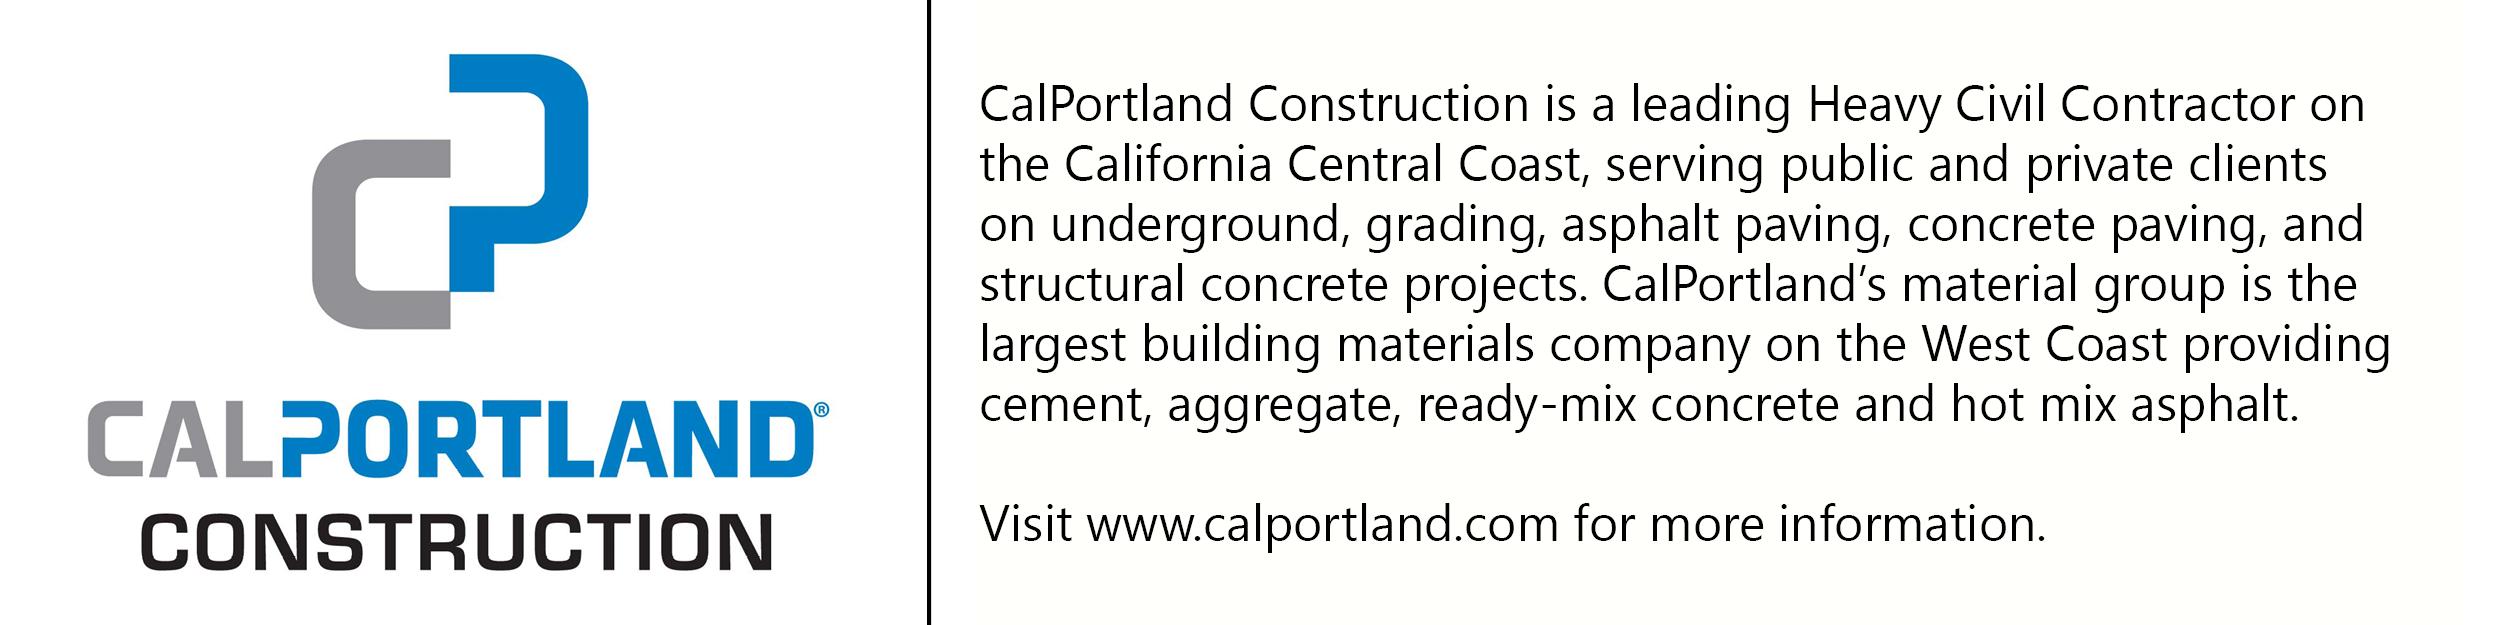 calportaland logo